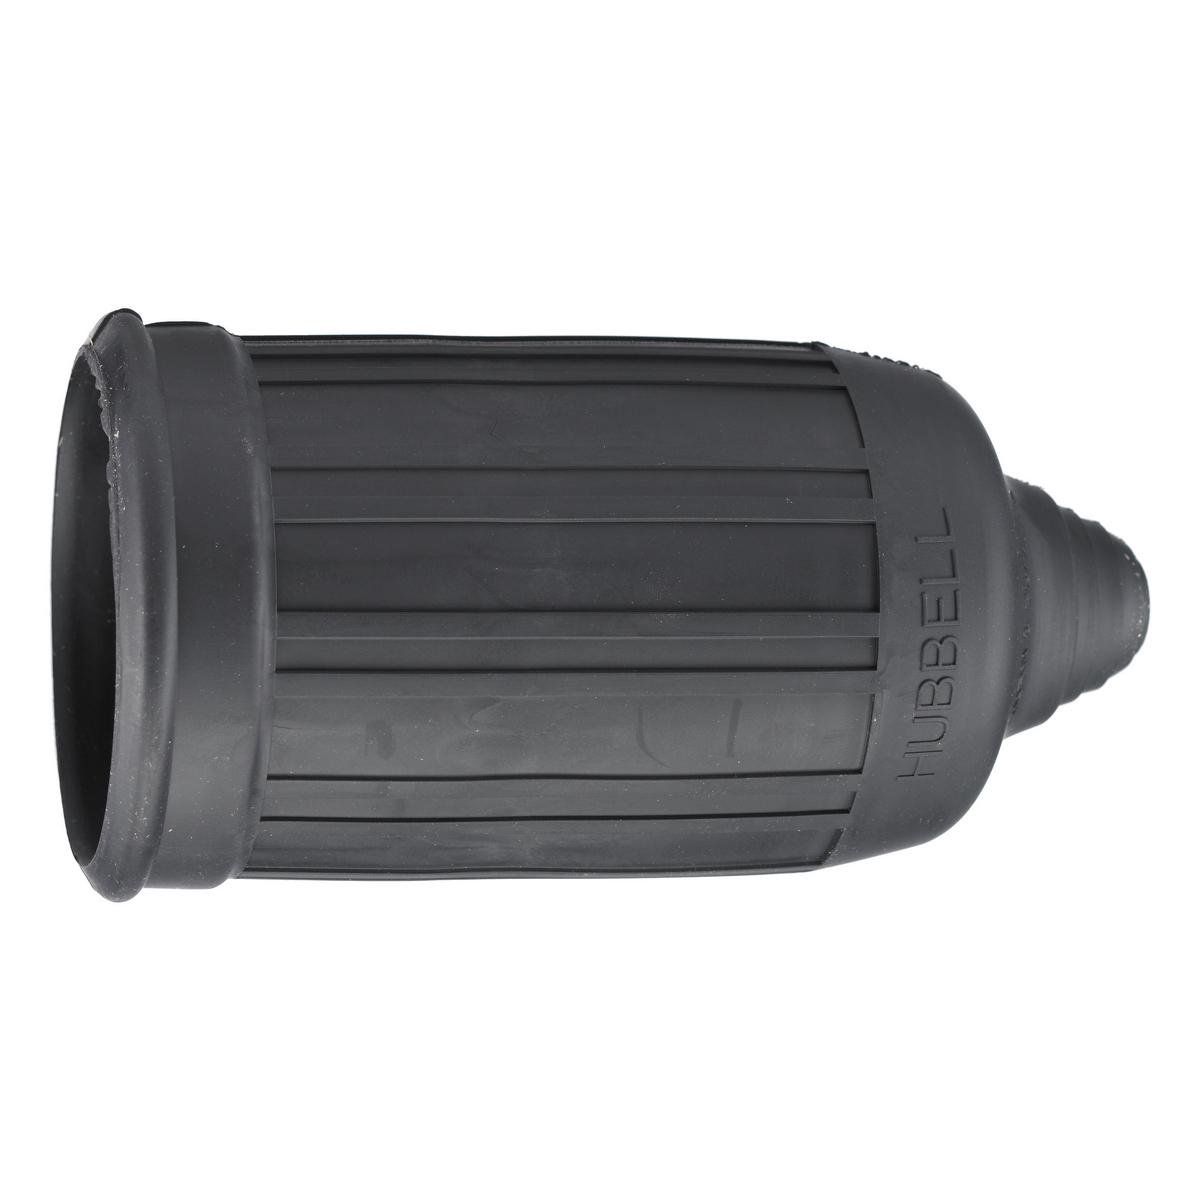 Hubbell HBL6036 Black Straight Blade Weatherproof Boot